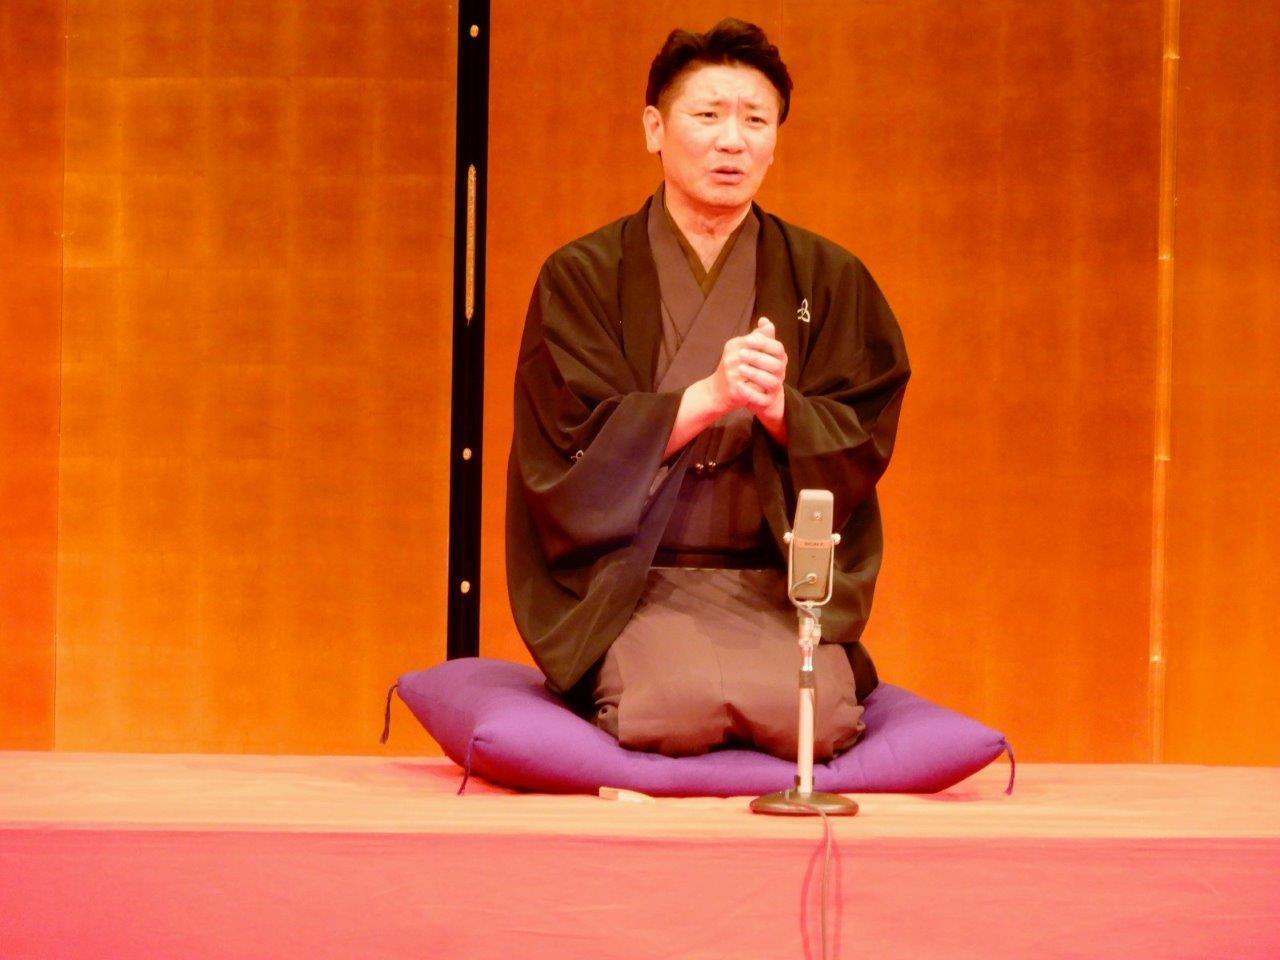 http://news.yoshimoto.co.jp/20180607210425-99e3e94286fc6e8edb034a04bb2dd3bb5ce0aa81.jpg